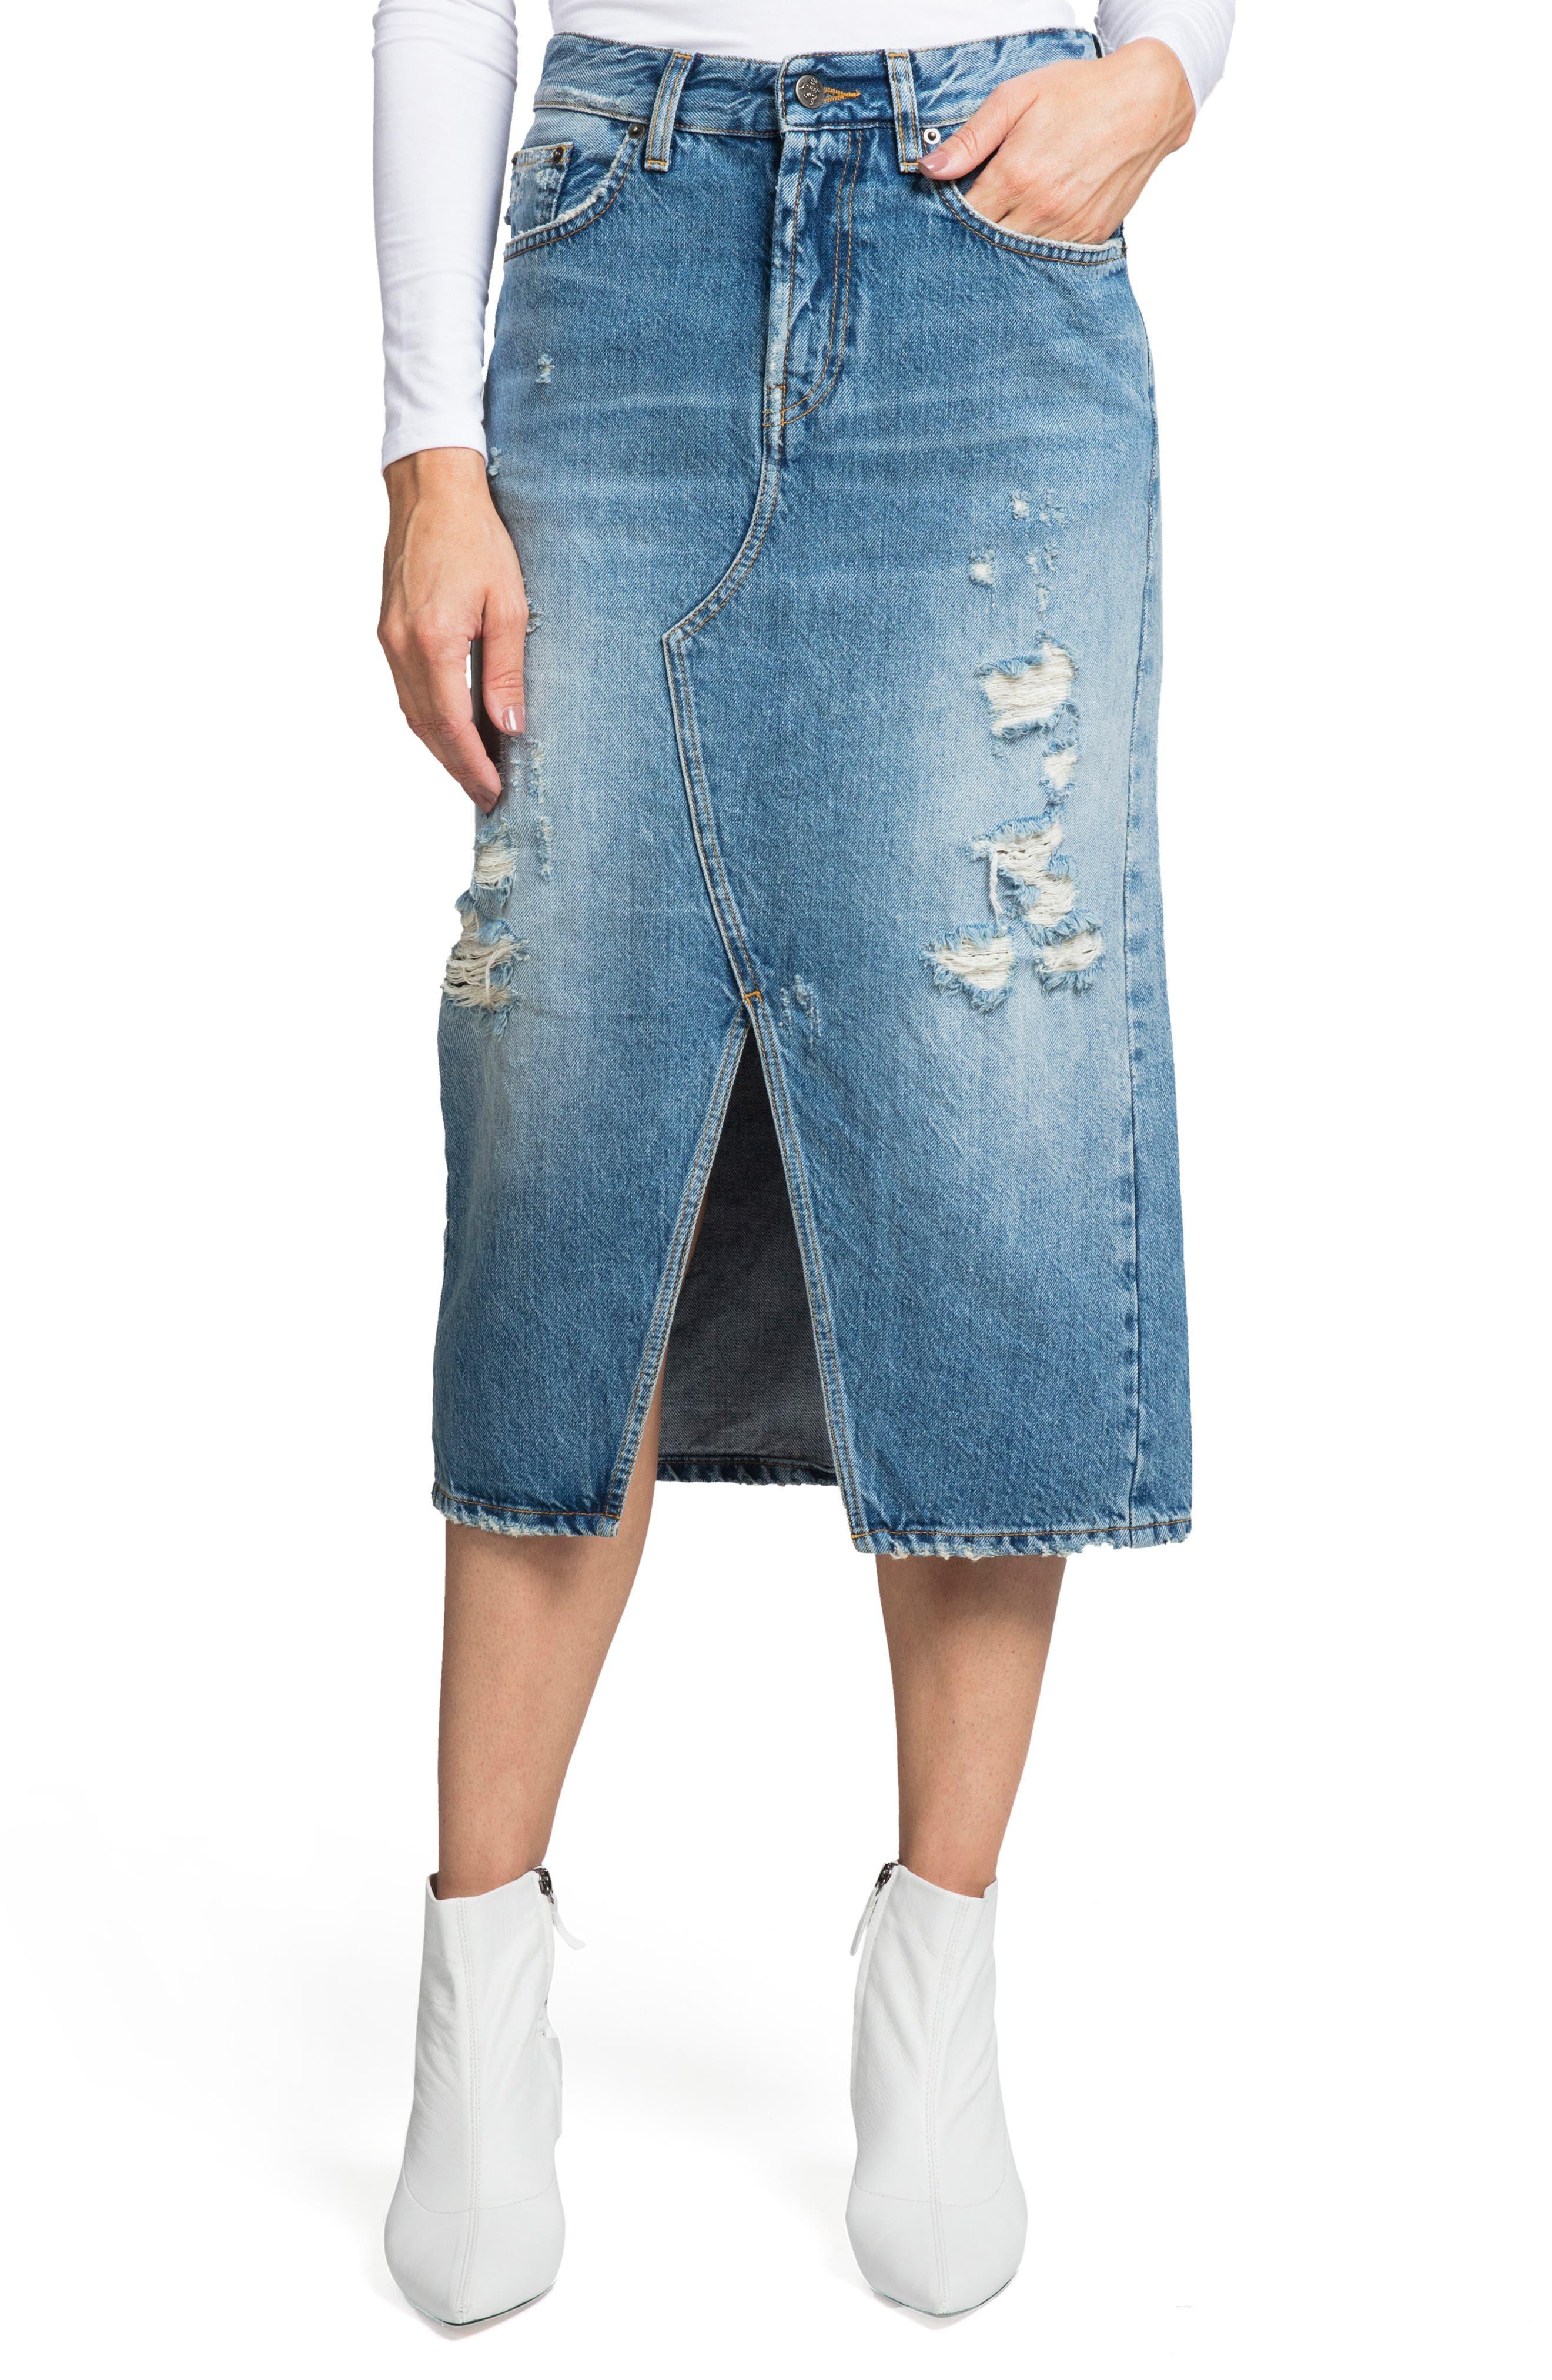 PRPS Split Front Distressed Denim Midi Skirt in Light Indigo